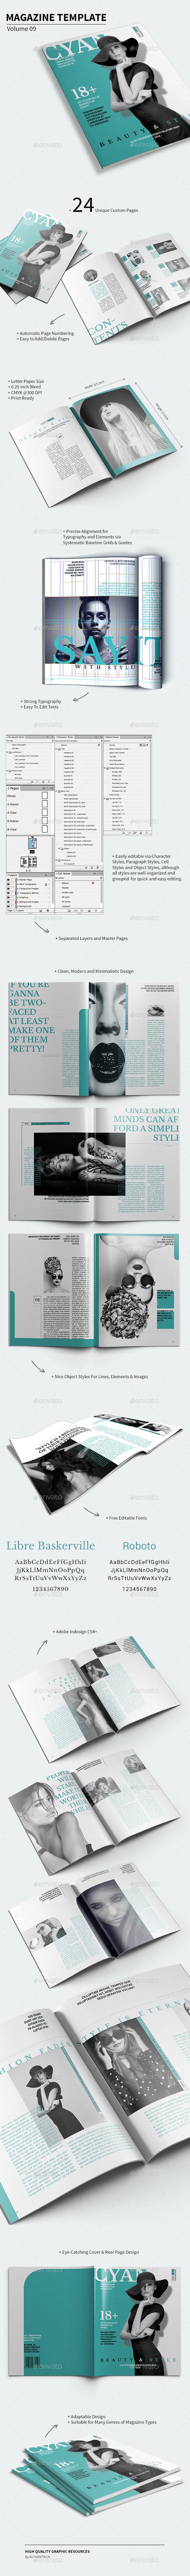 Magazine Template - Volume 09 - Magazines Print Templates